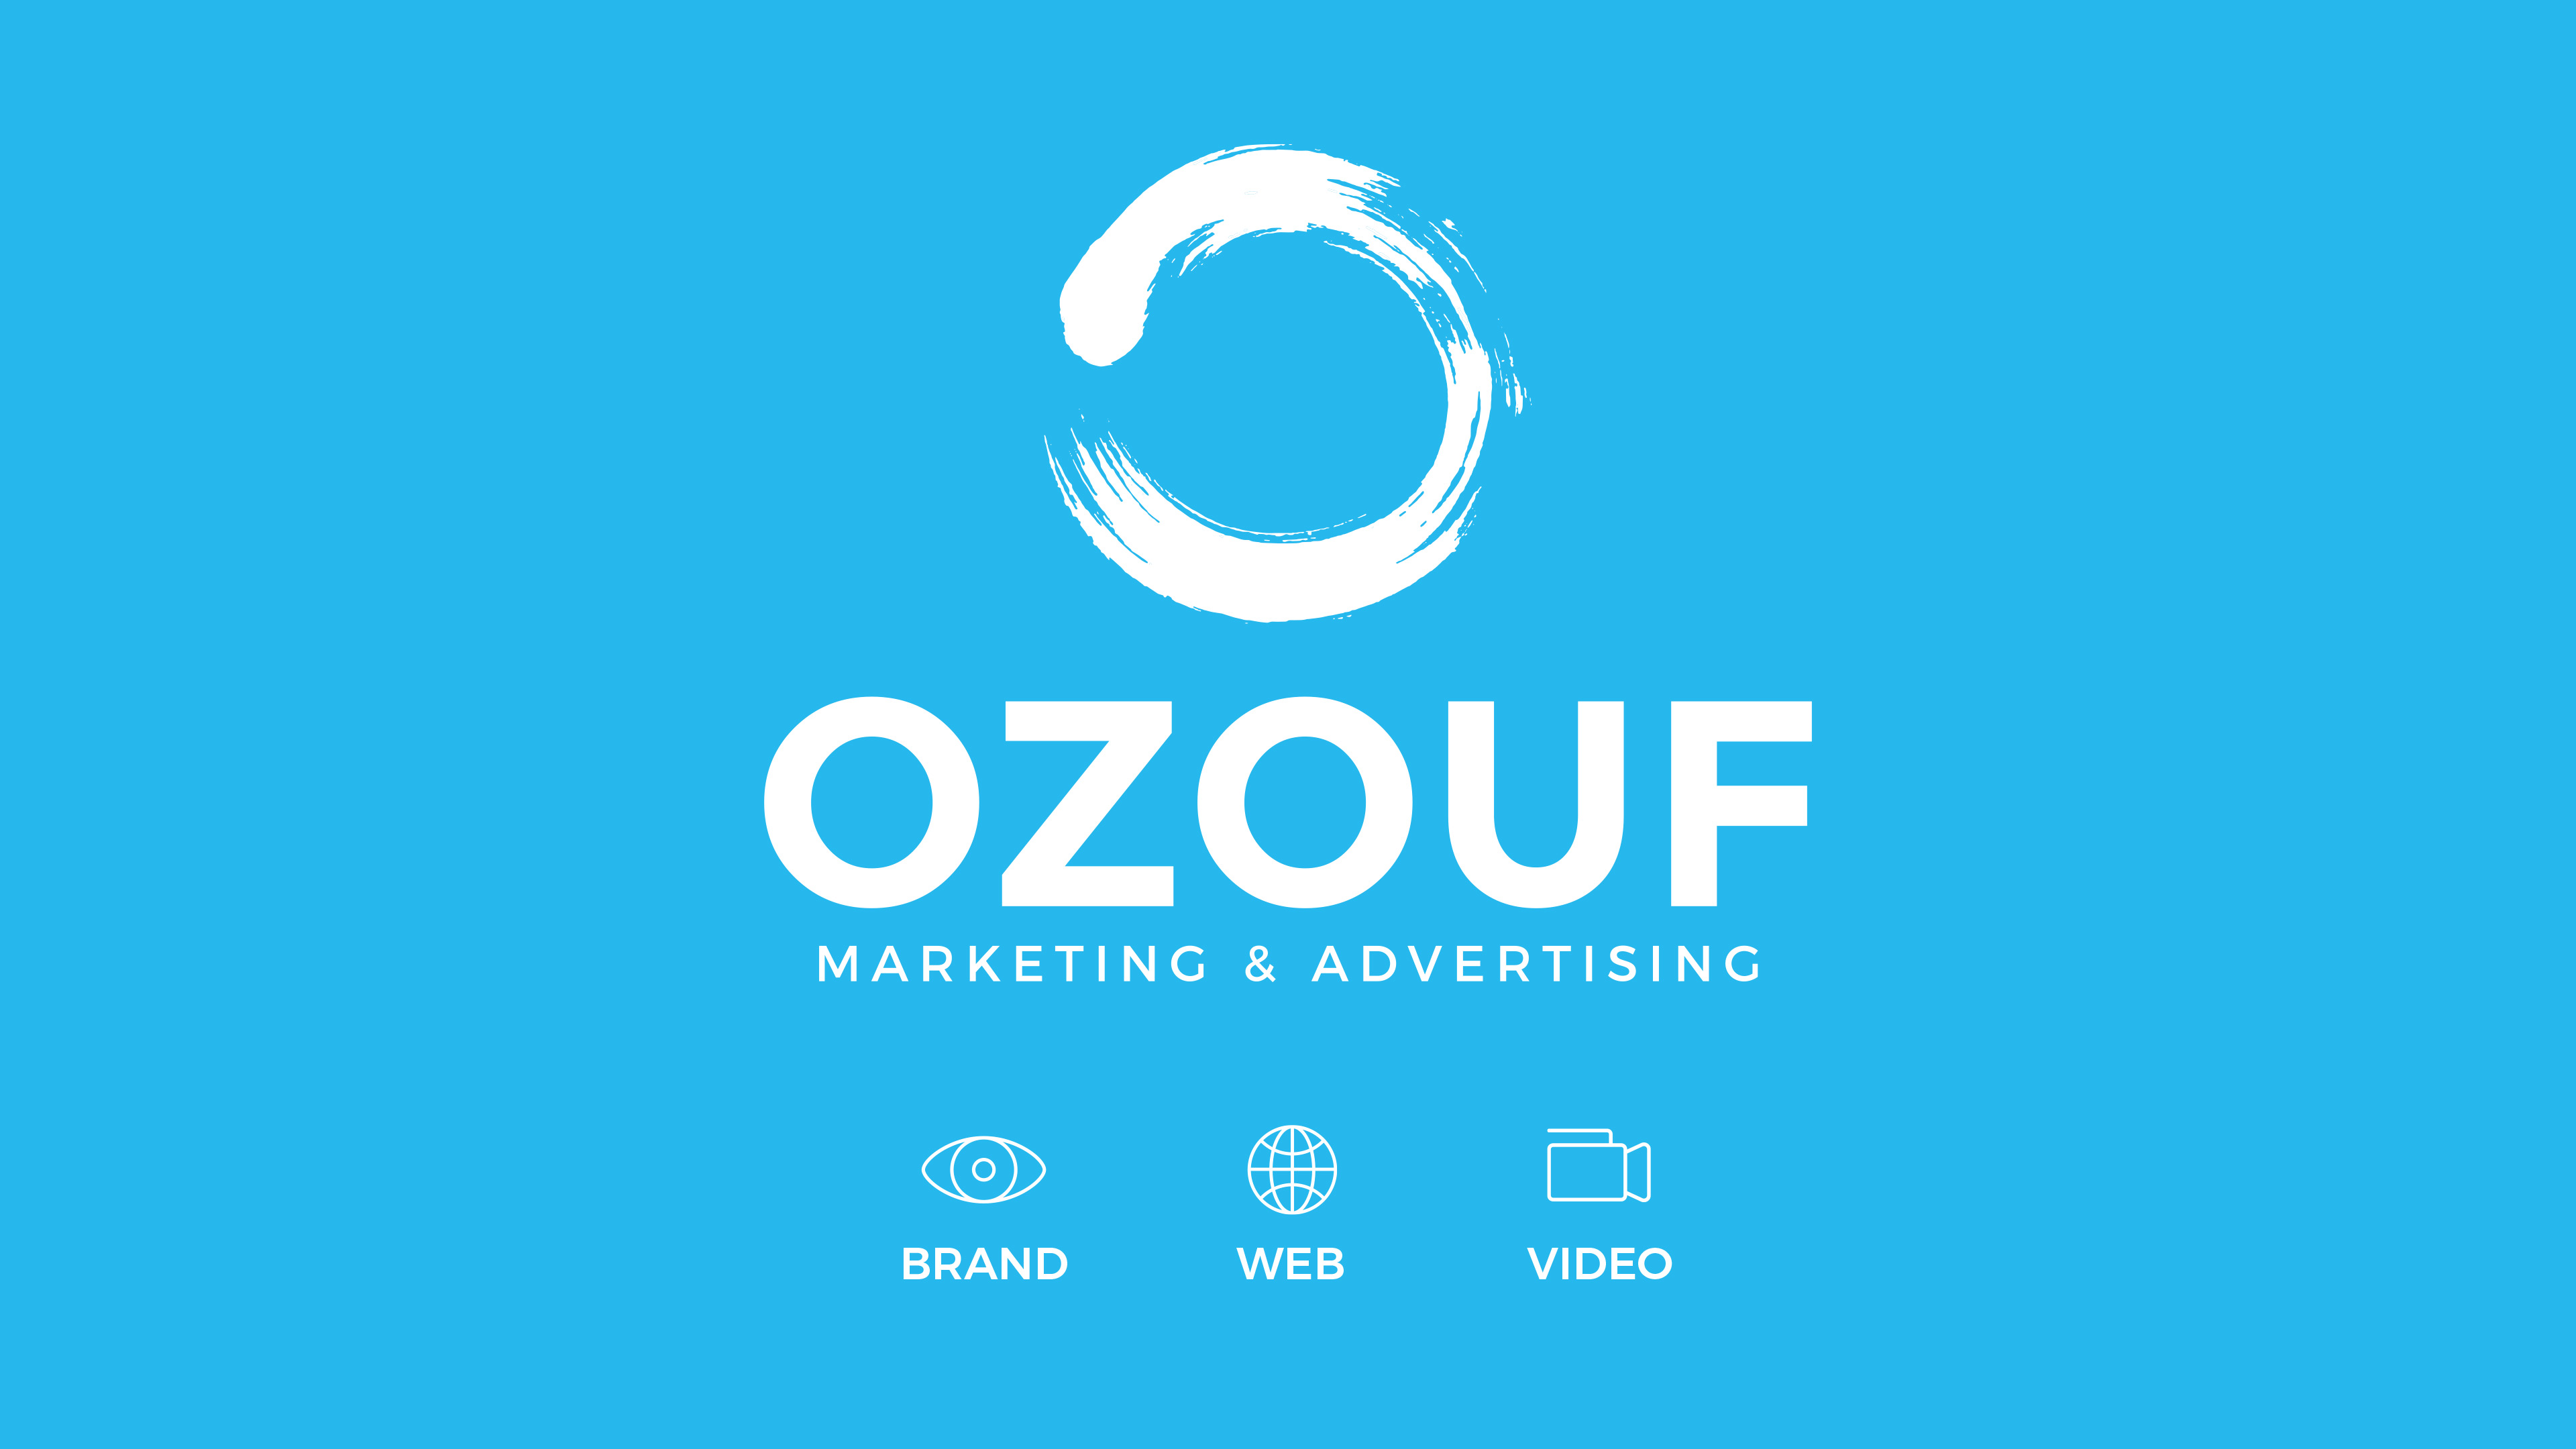 OZOUF Marketing & Advertising